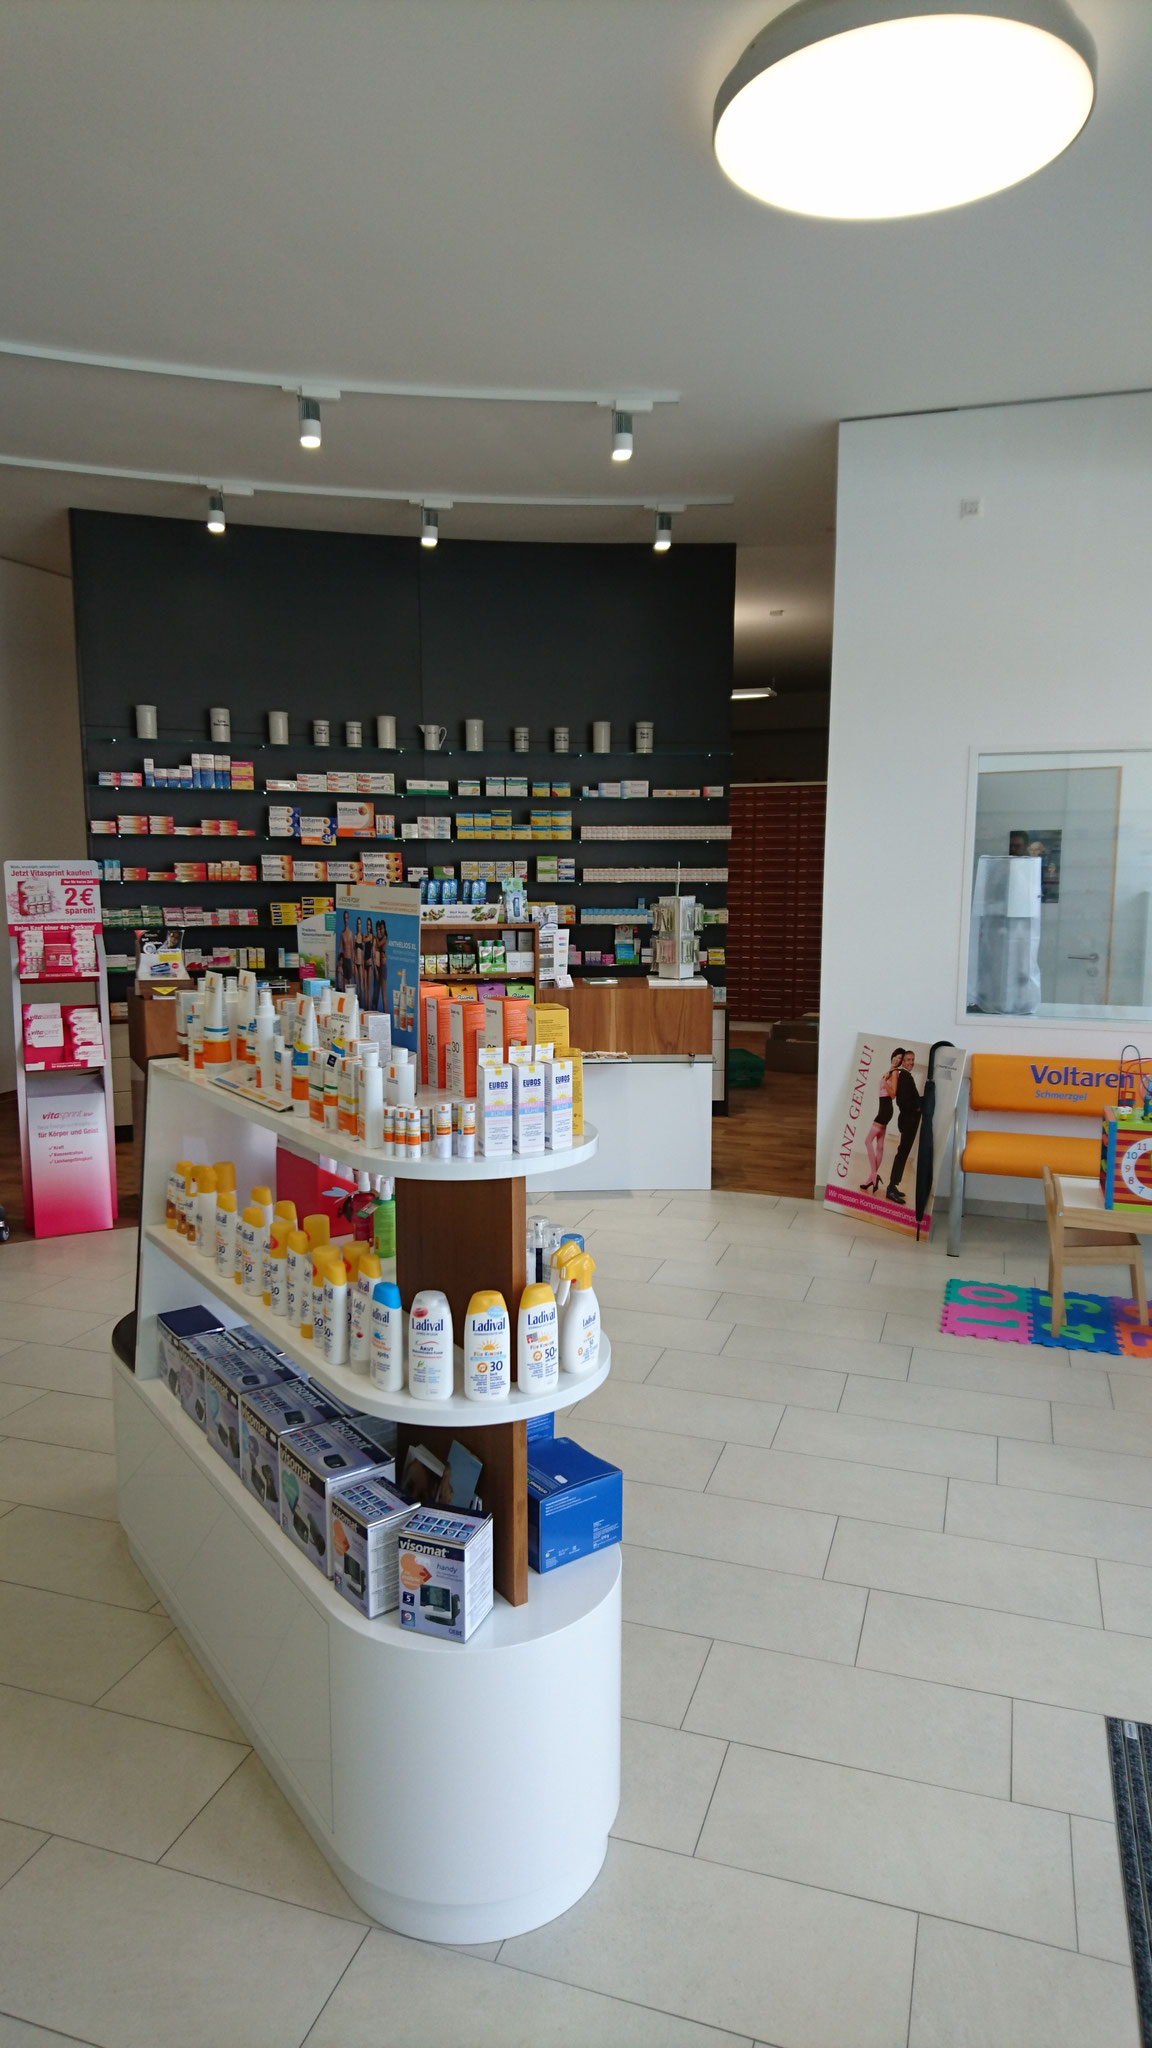 Candis Apotheke, Verkauf